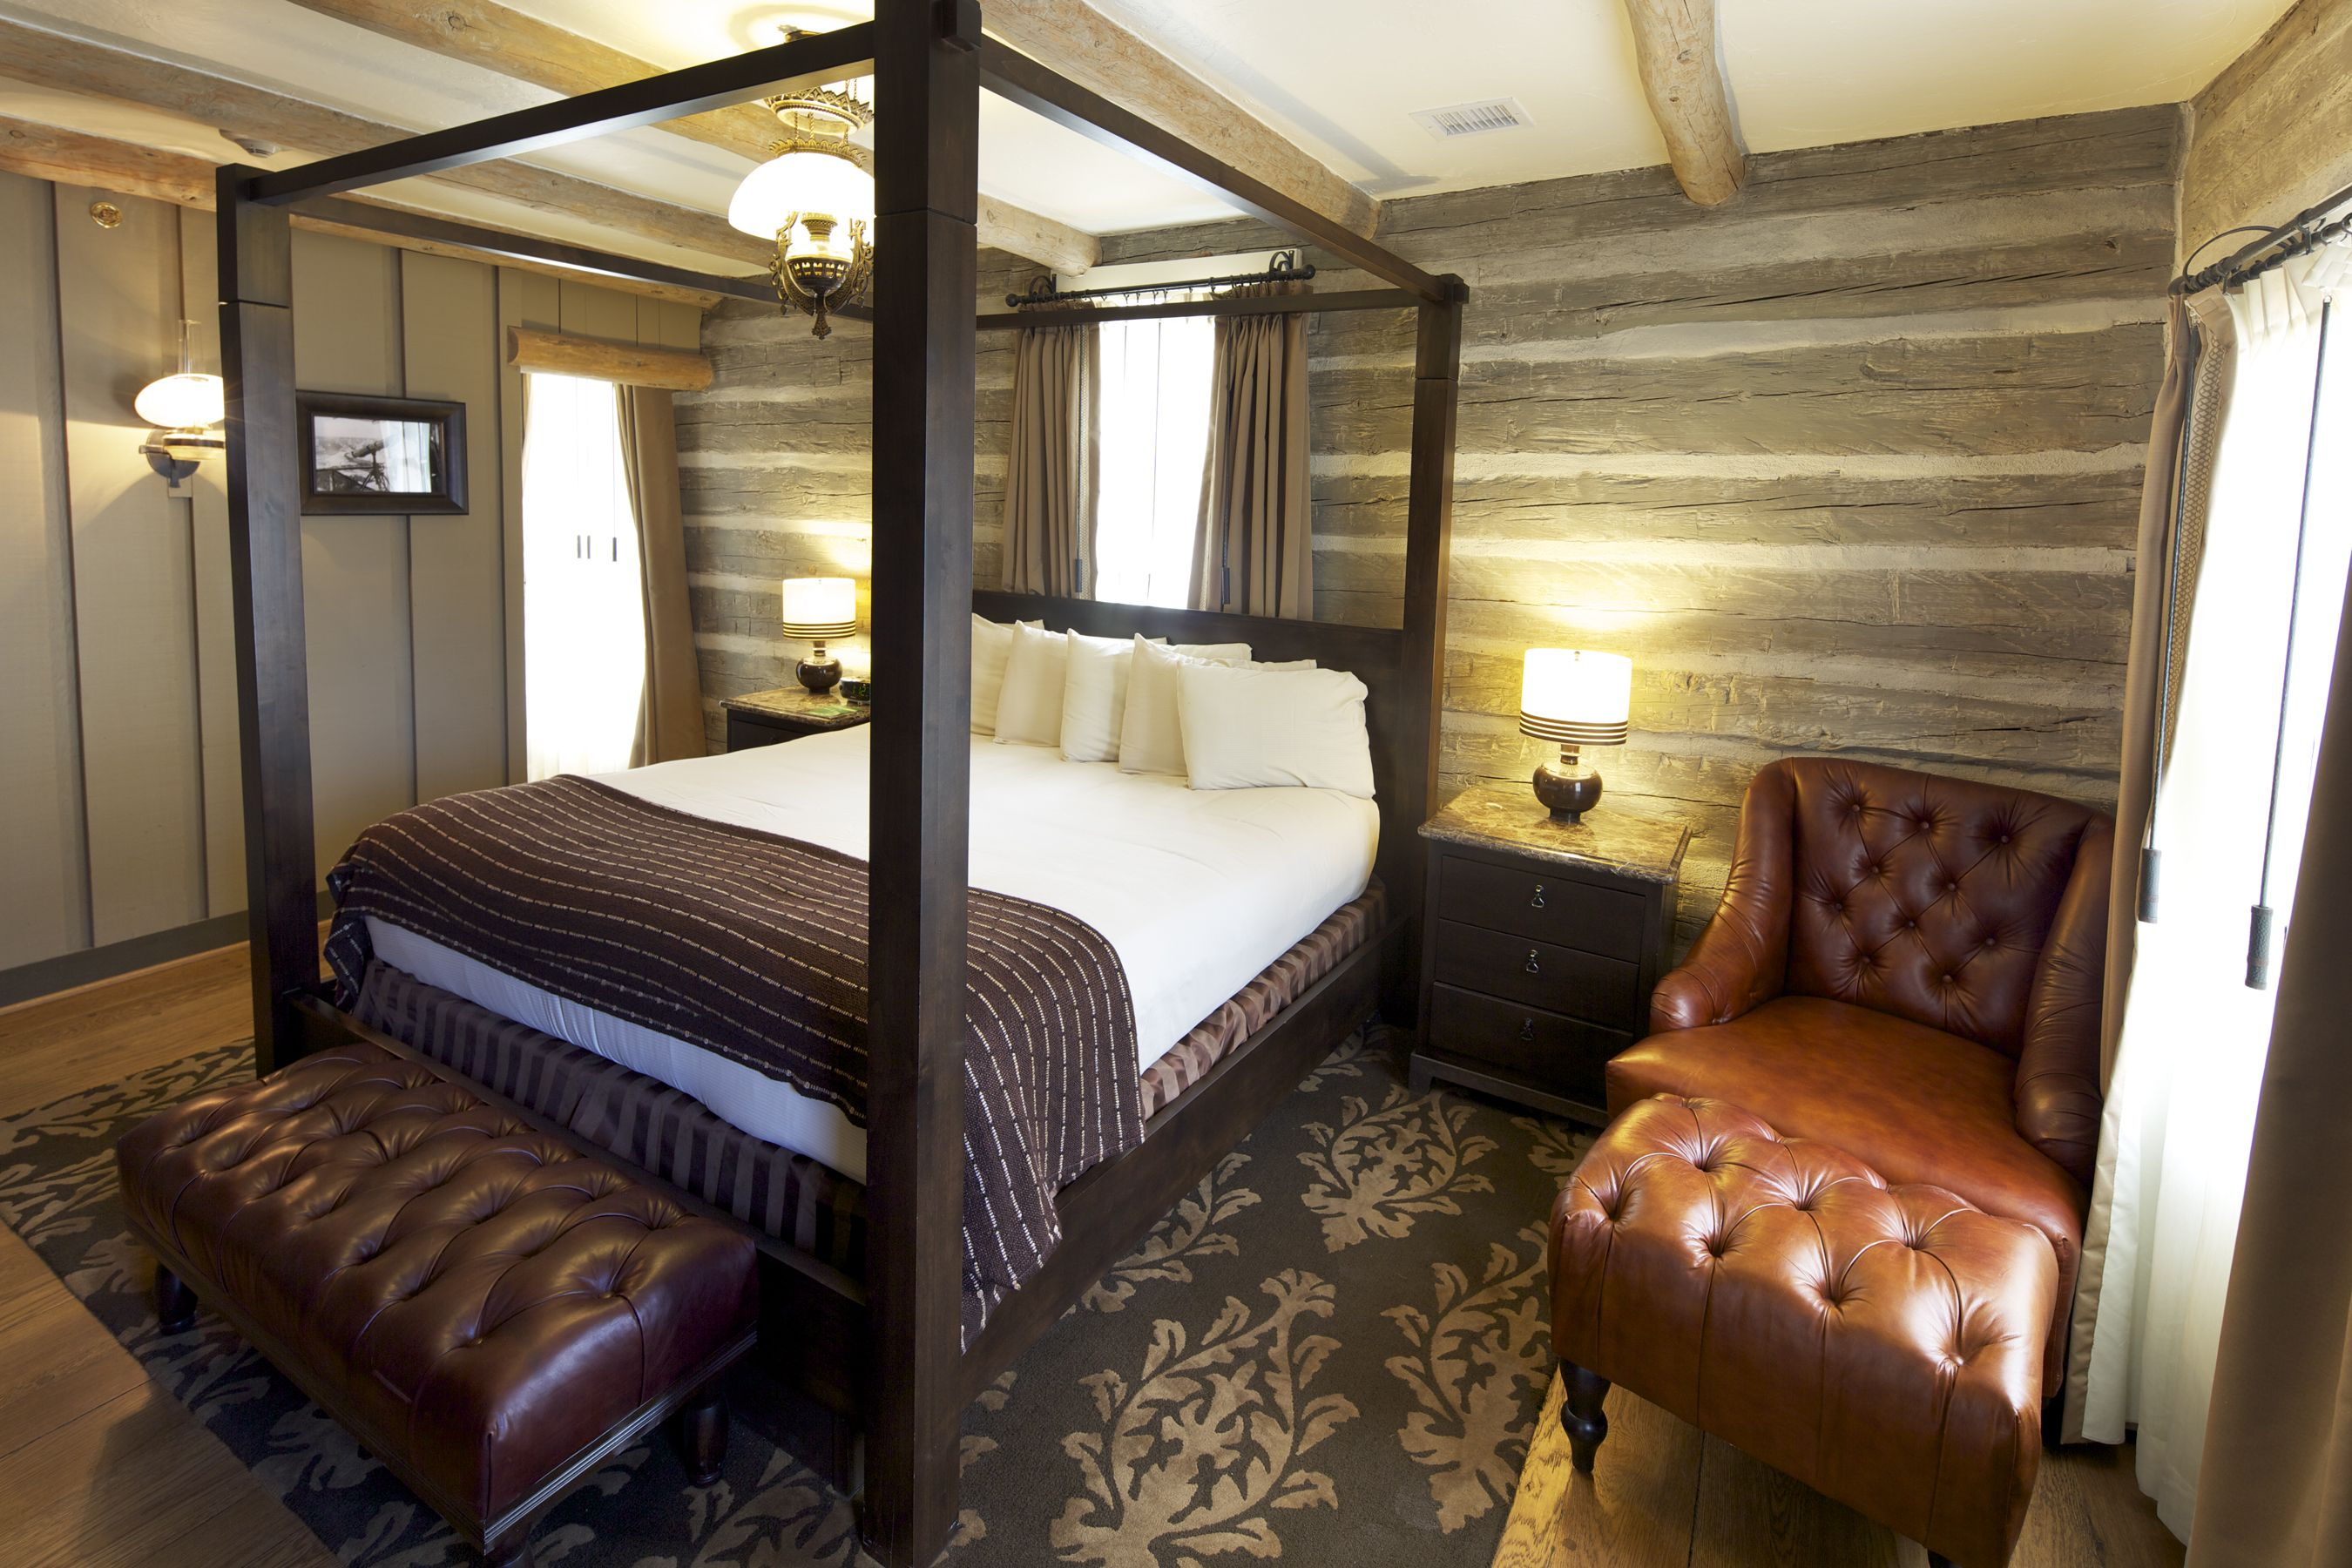 destination talentneeds cabin grand image log cabins com lovely property in canyon